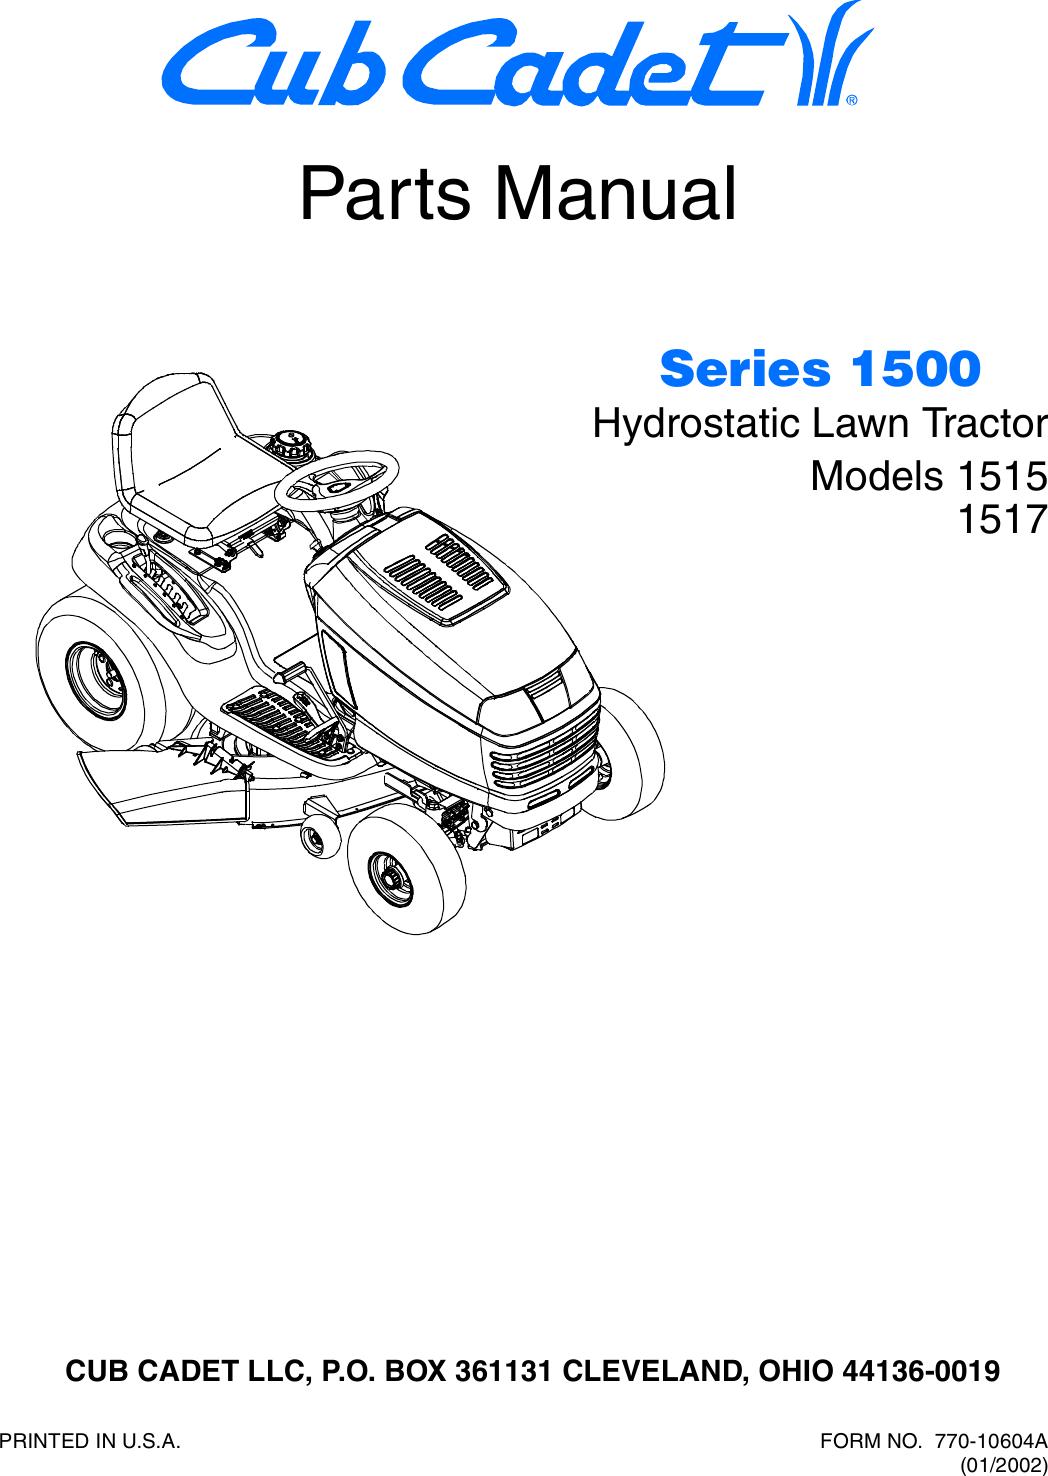 Cub Cadet Hydrostatic Lawn Tractor 1515 Parts Manual 770 10604a Wiring Diagram